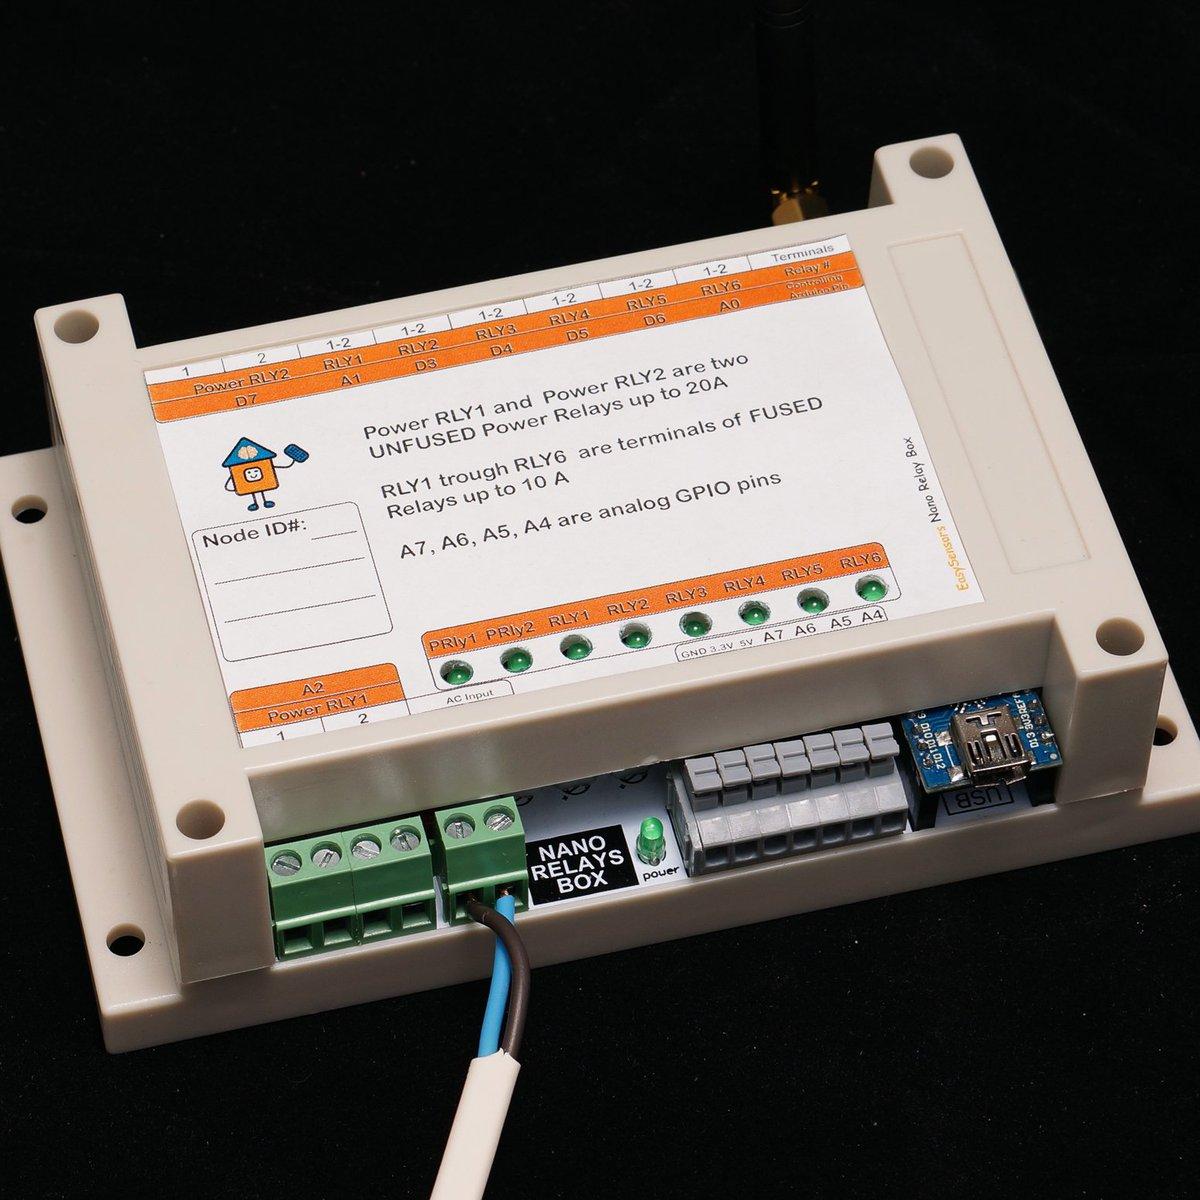 Arduino Nano 8 Relay Board wireless RFM69/95 NRF24 from easySensors